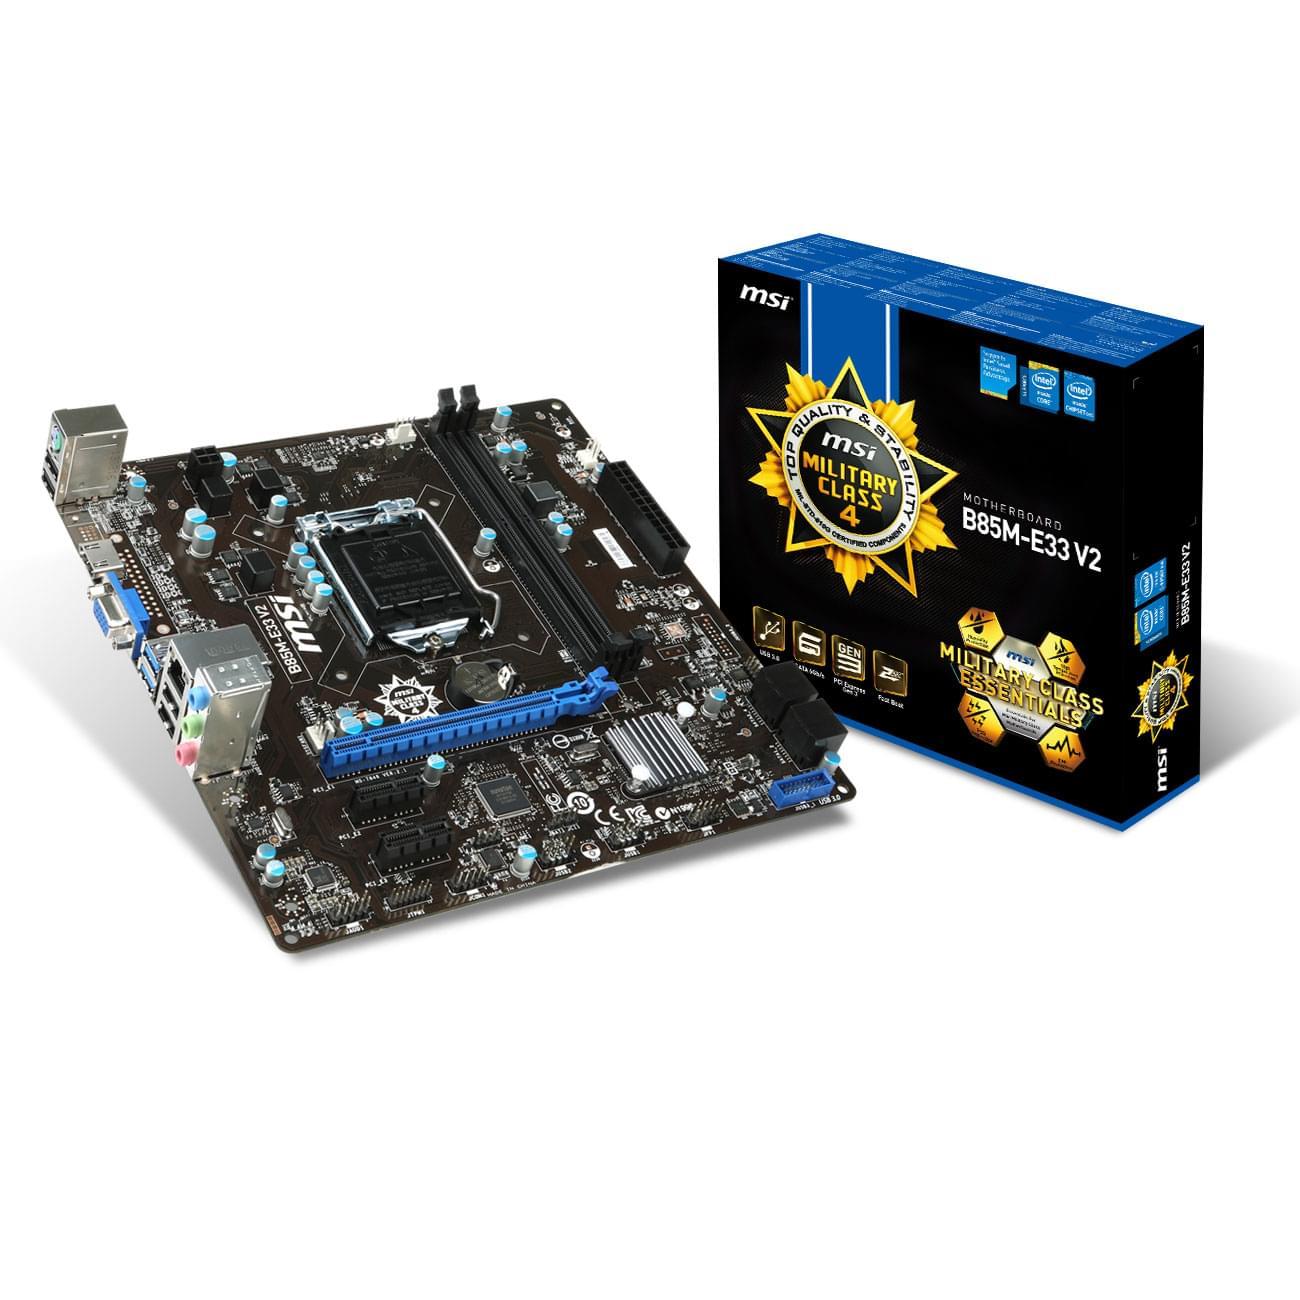 MSI B85M-E33 V2 Micro-ATX DDR3 - Carte mère MSI - Cybertek.fr - 0